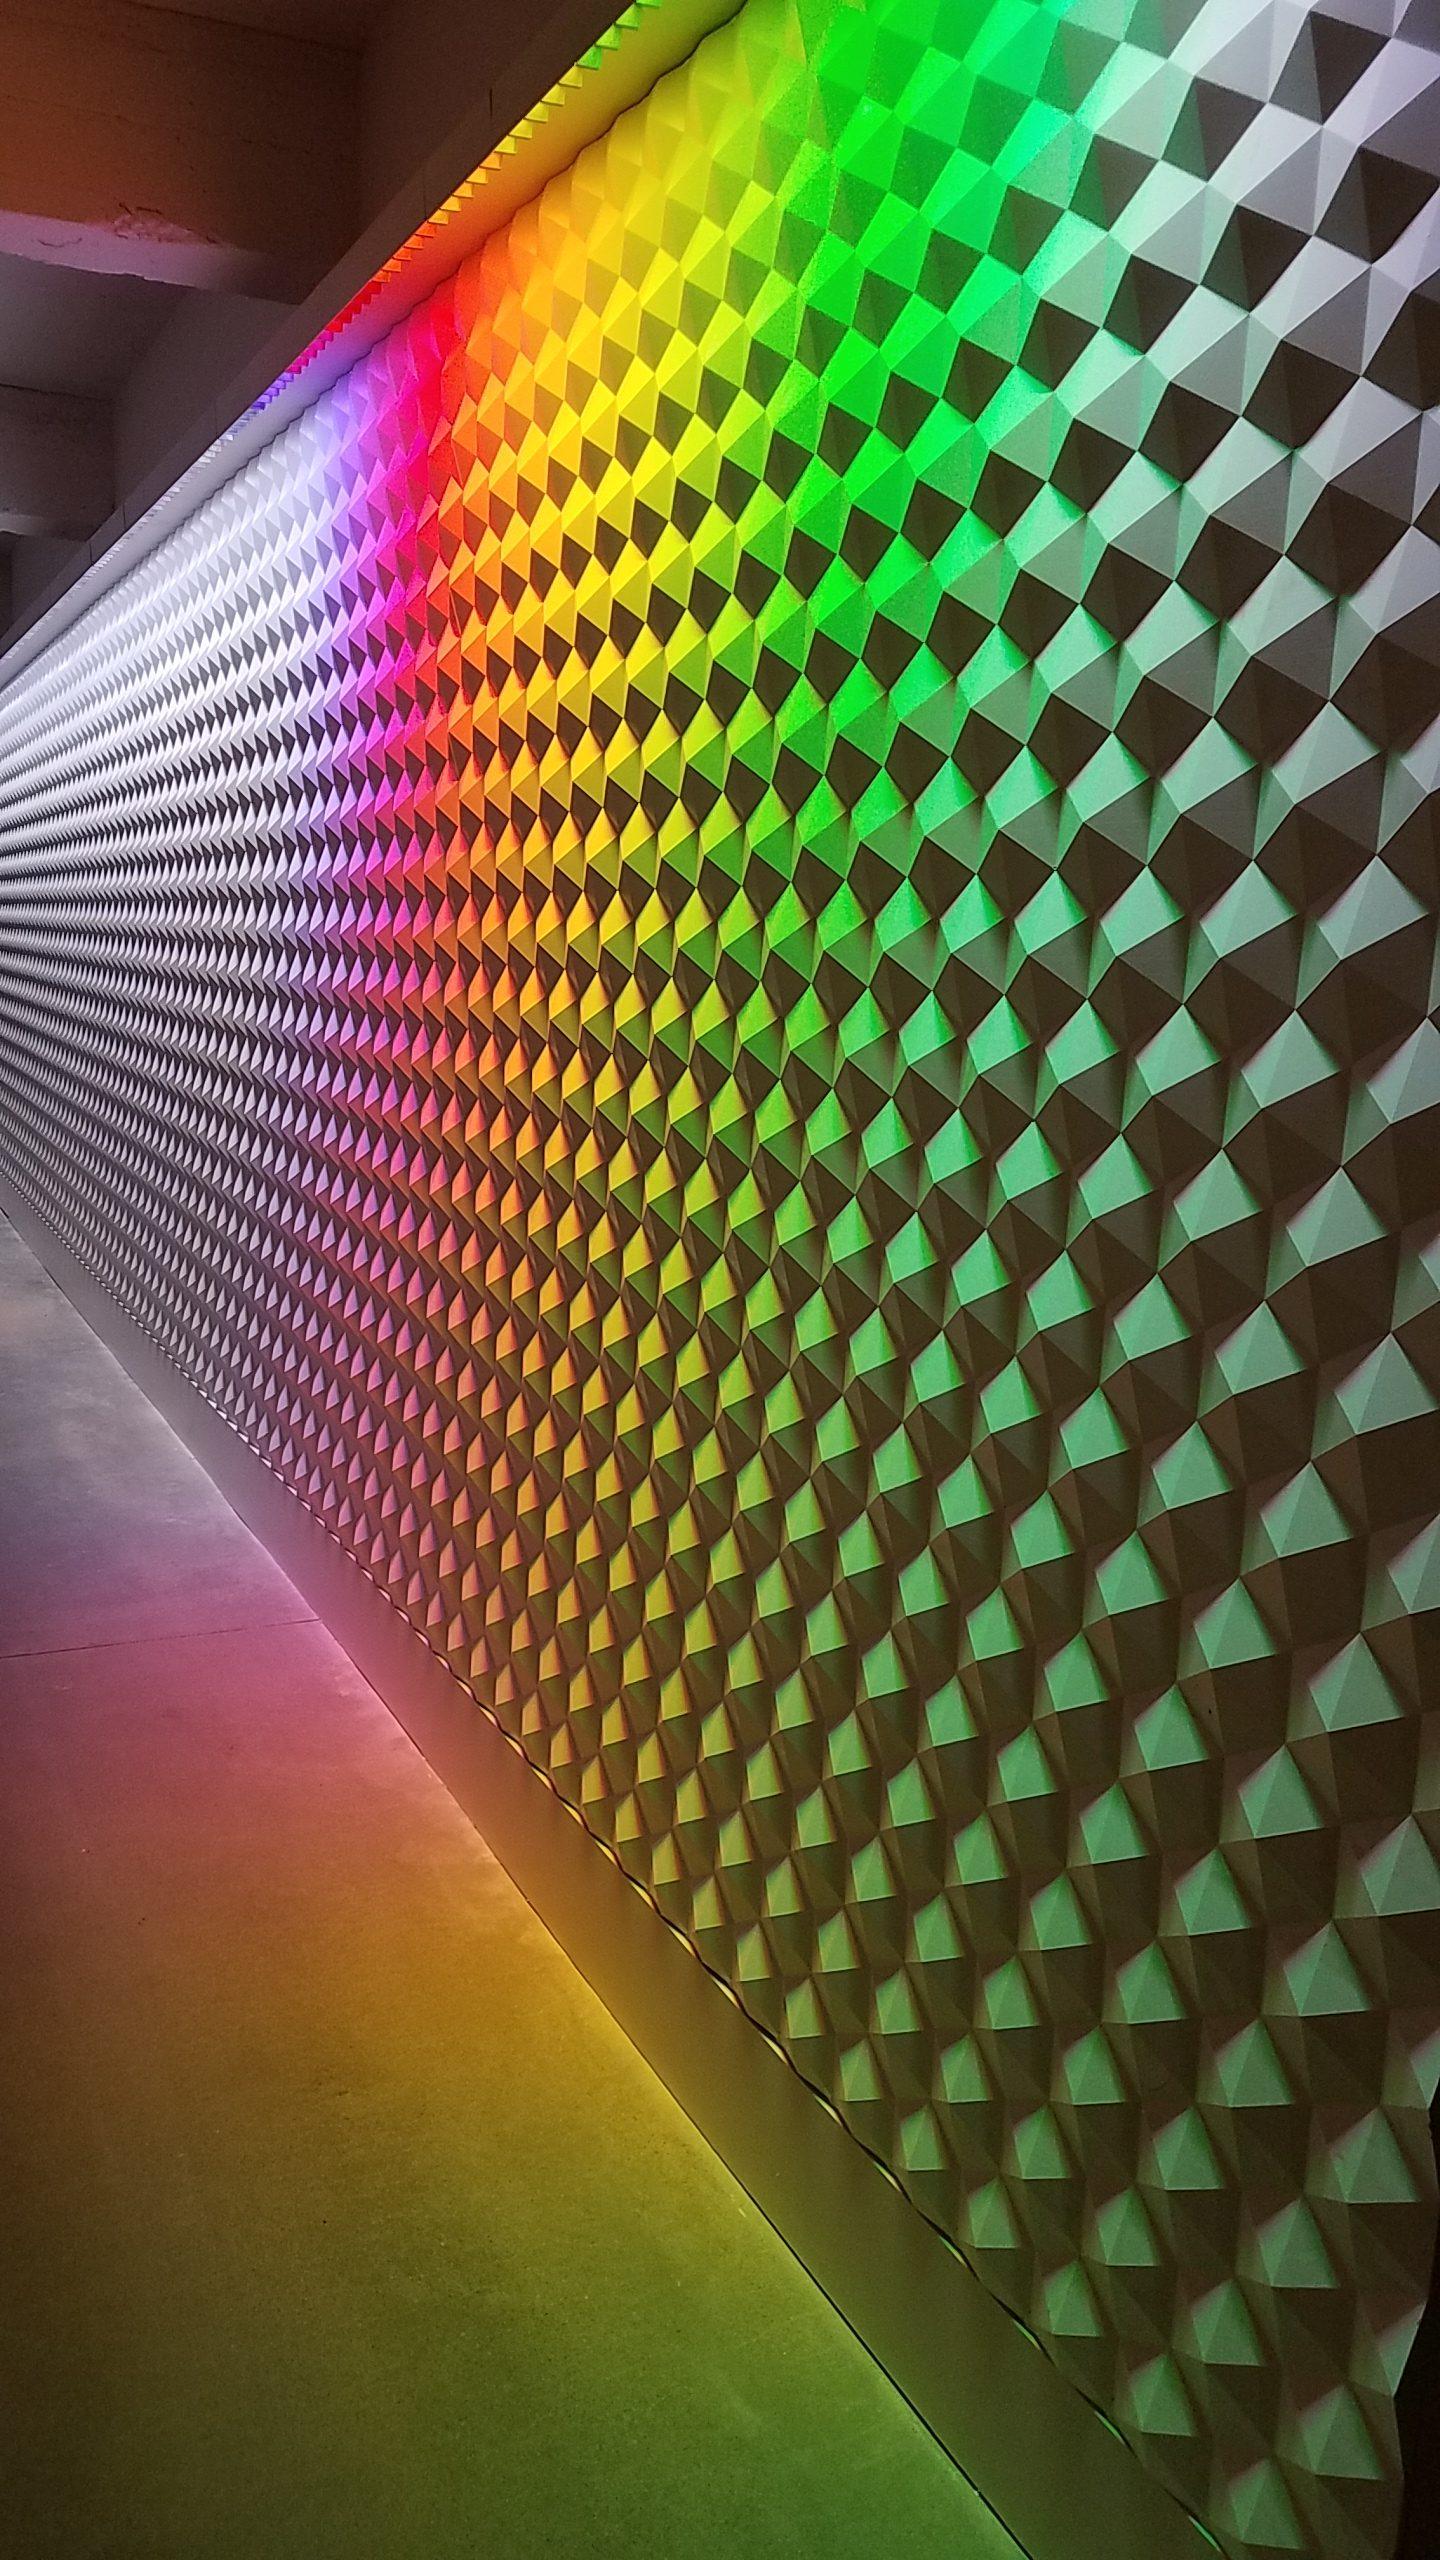 Stockyard Spectrum